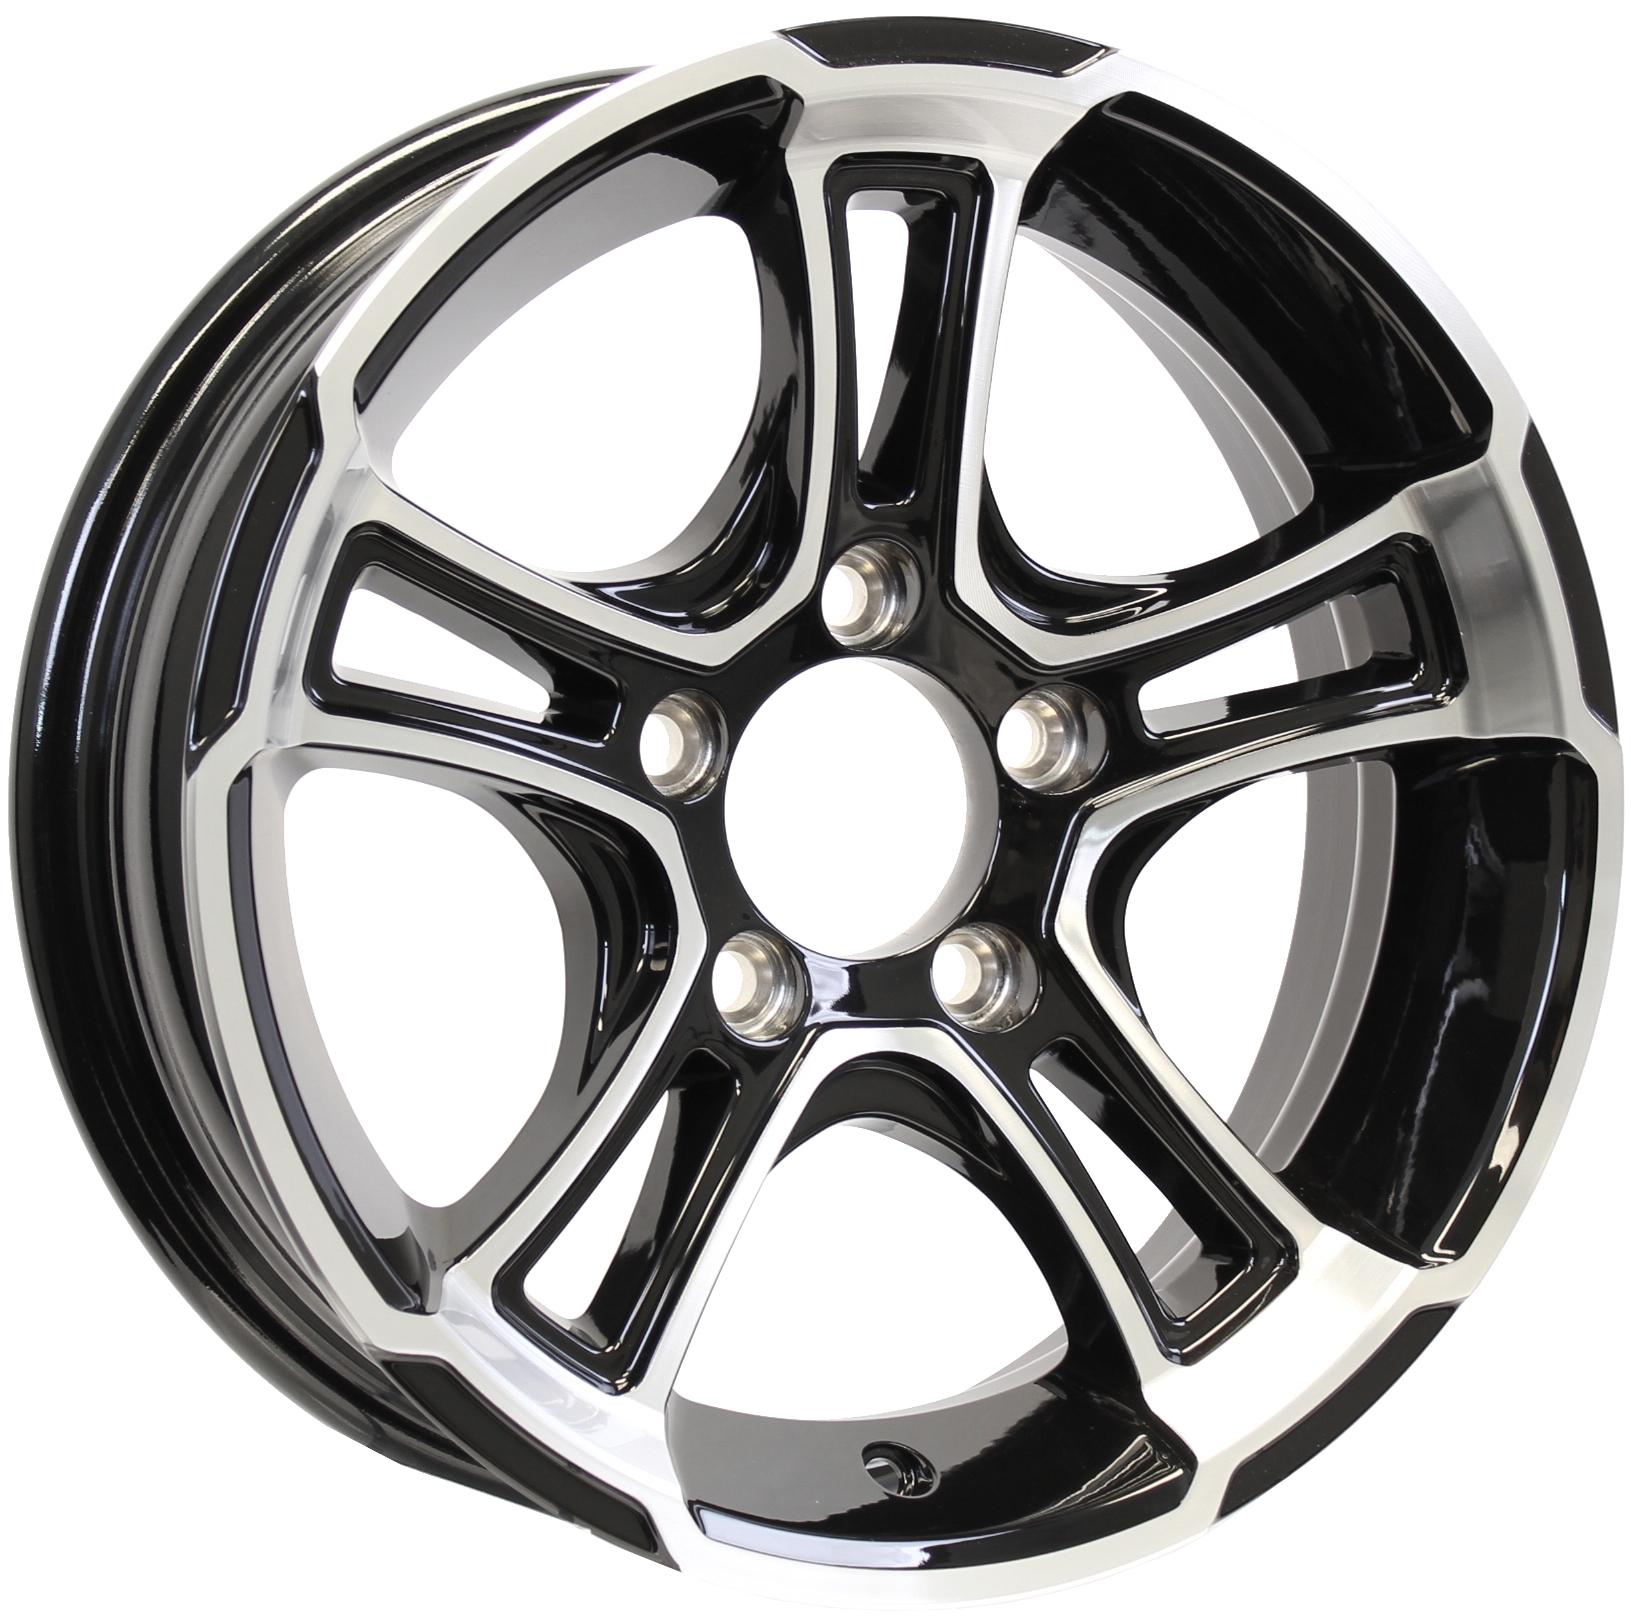 Whitehawk 15x5 5-4.5 Black Aluminum Trailer Wheel Image